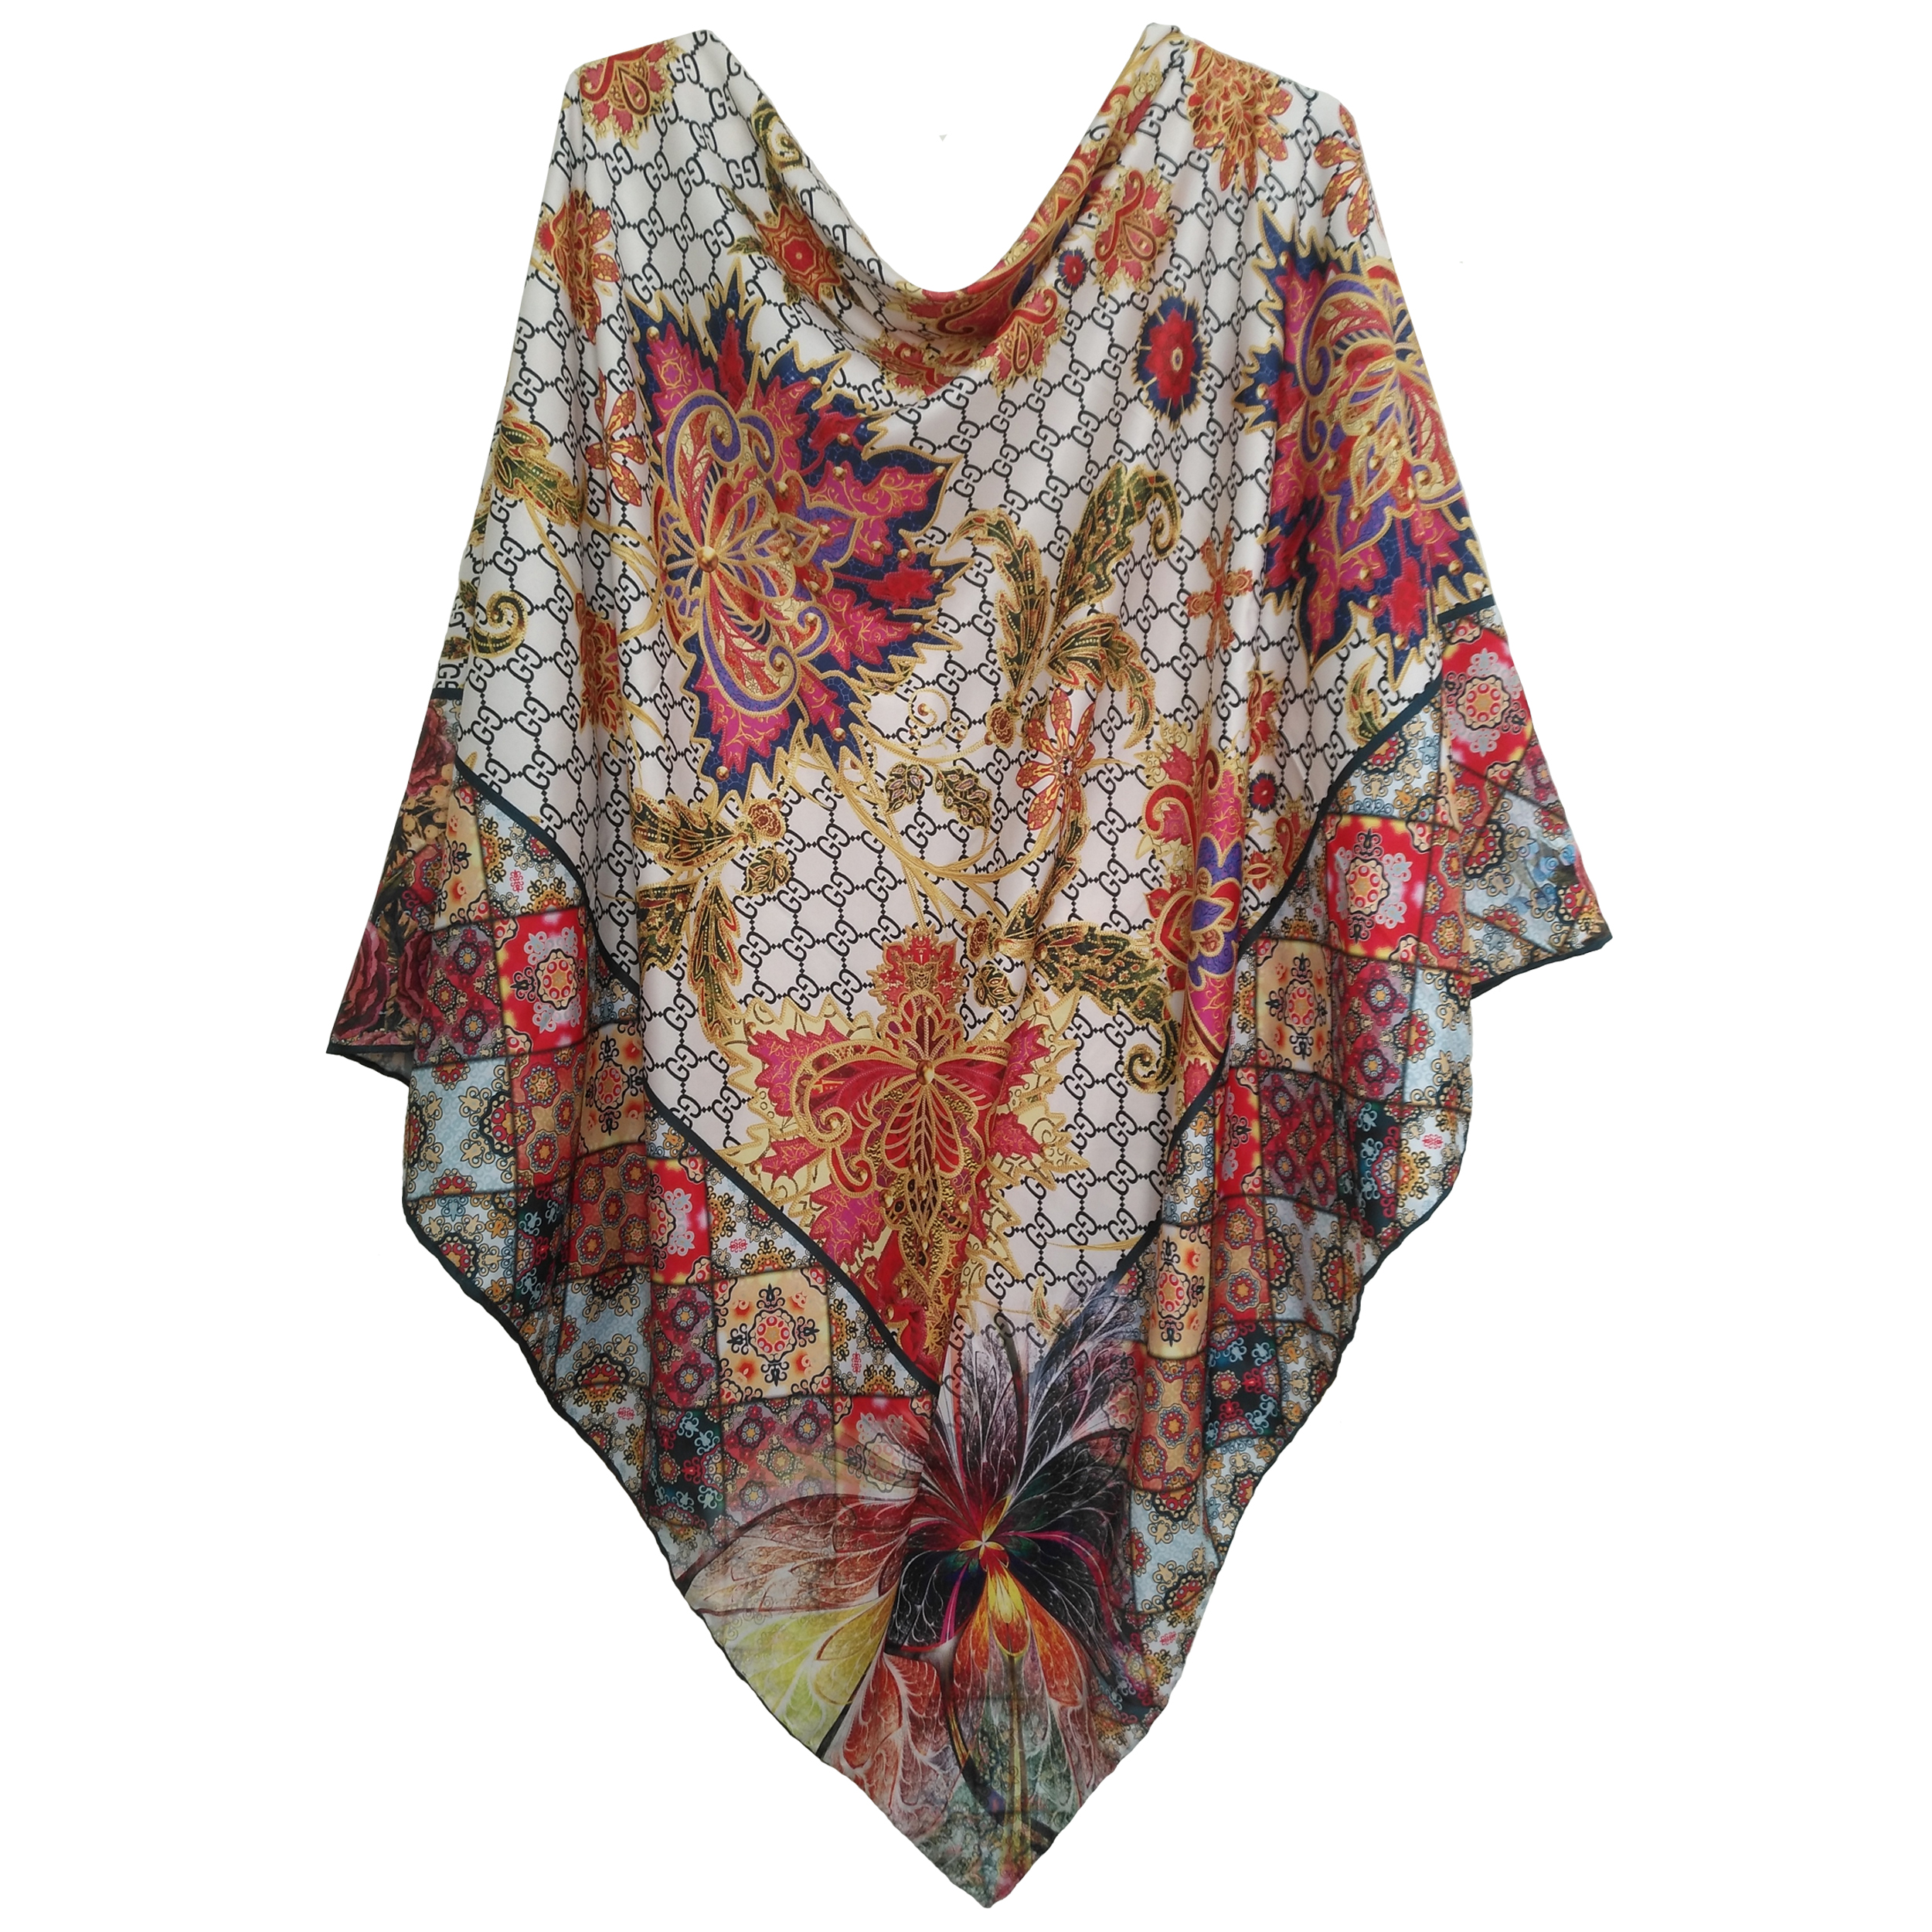 روسری ابریشم دست دوز زنانه طرح سورنا کد SH-01